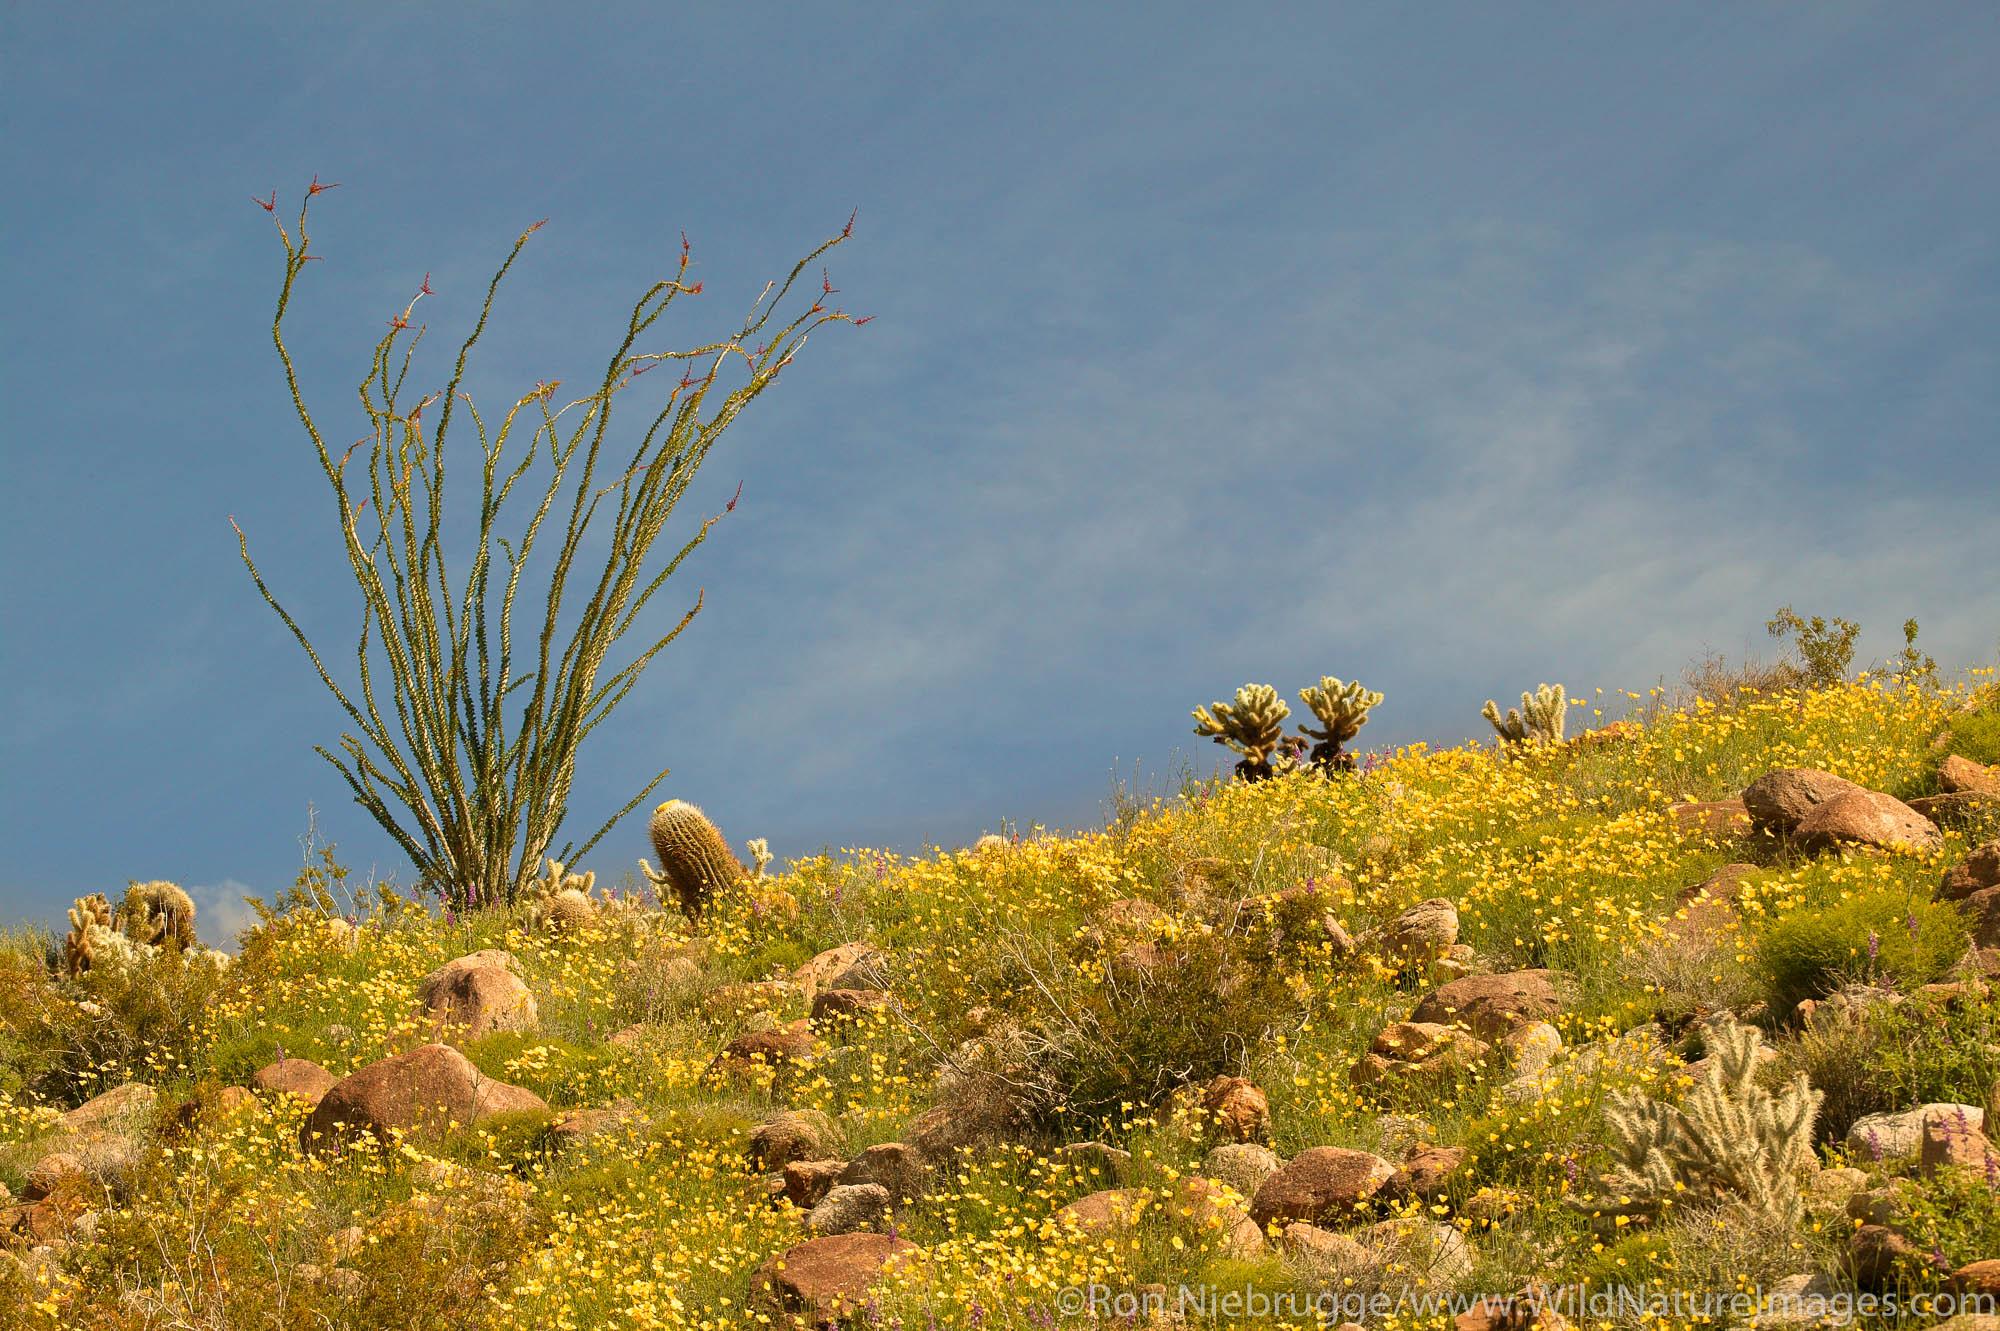 Wildflowers including Arizona Lupine (Lupinus arizonicus), Desert Gold Poppy or Goldenpoppy (Eschscholzia glyptosperma) Brittlebush...